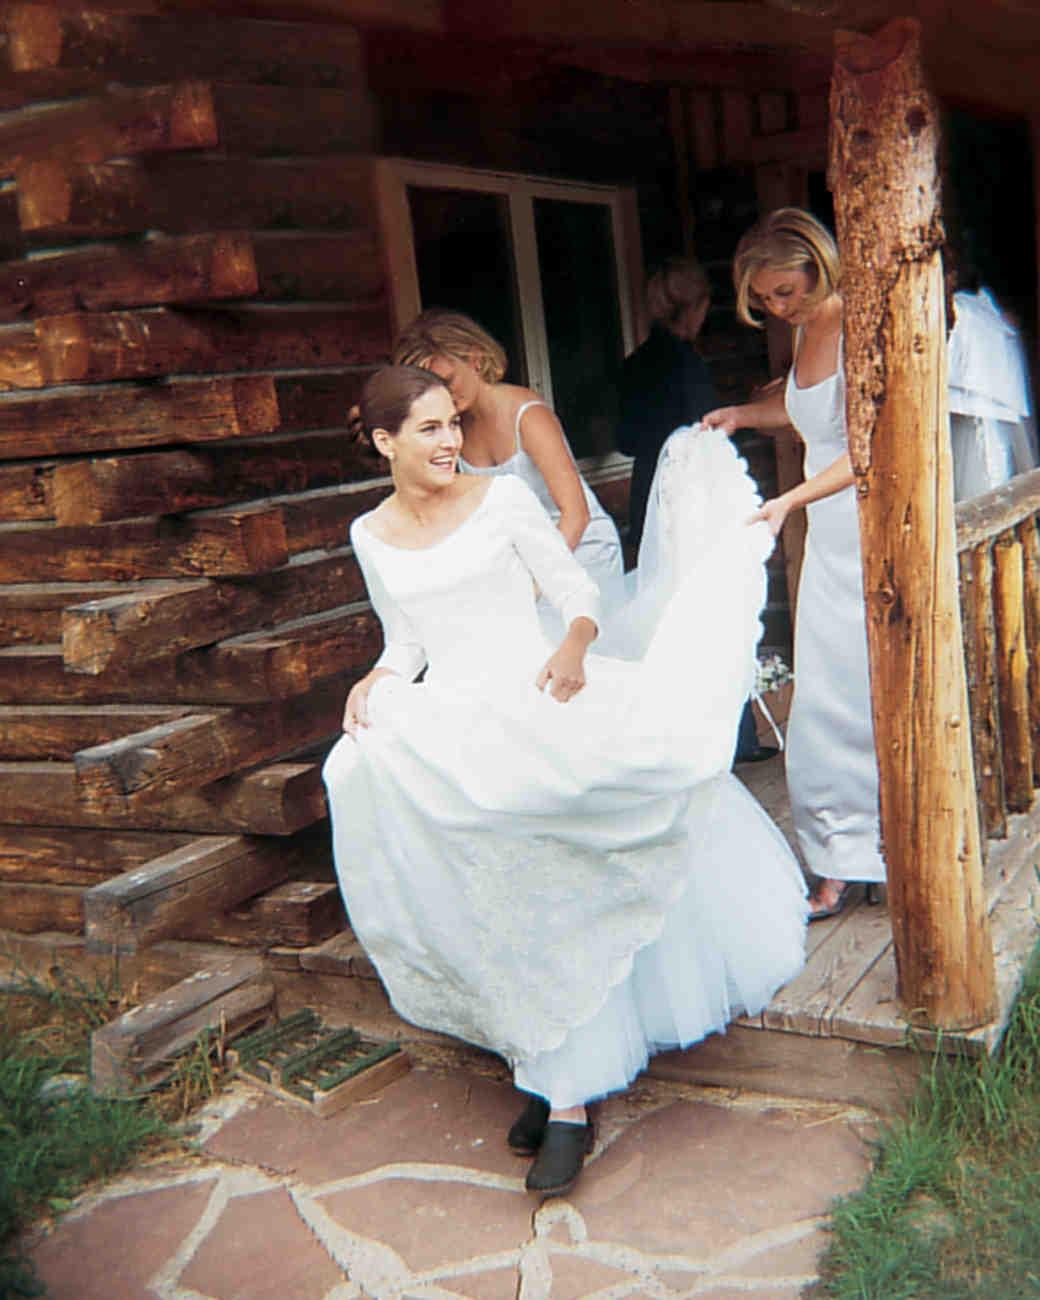 john-dolan-wedding-photographer-summer-2000-0914.jpg